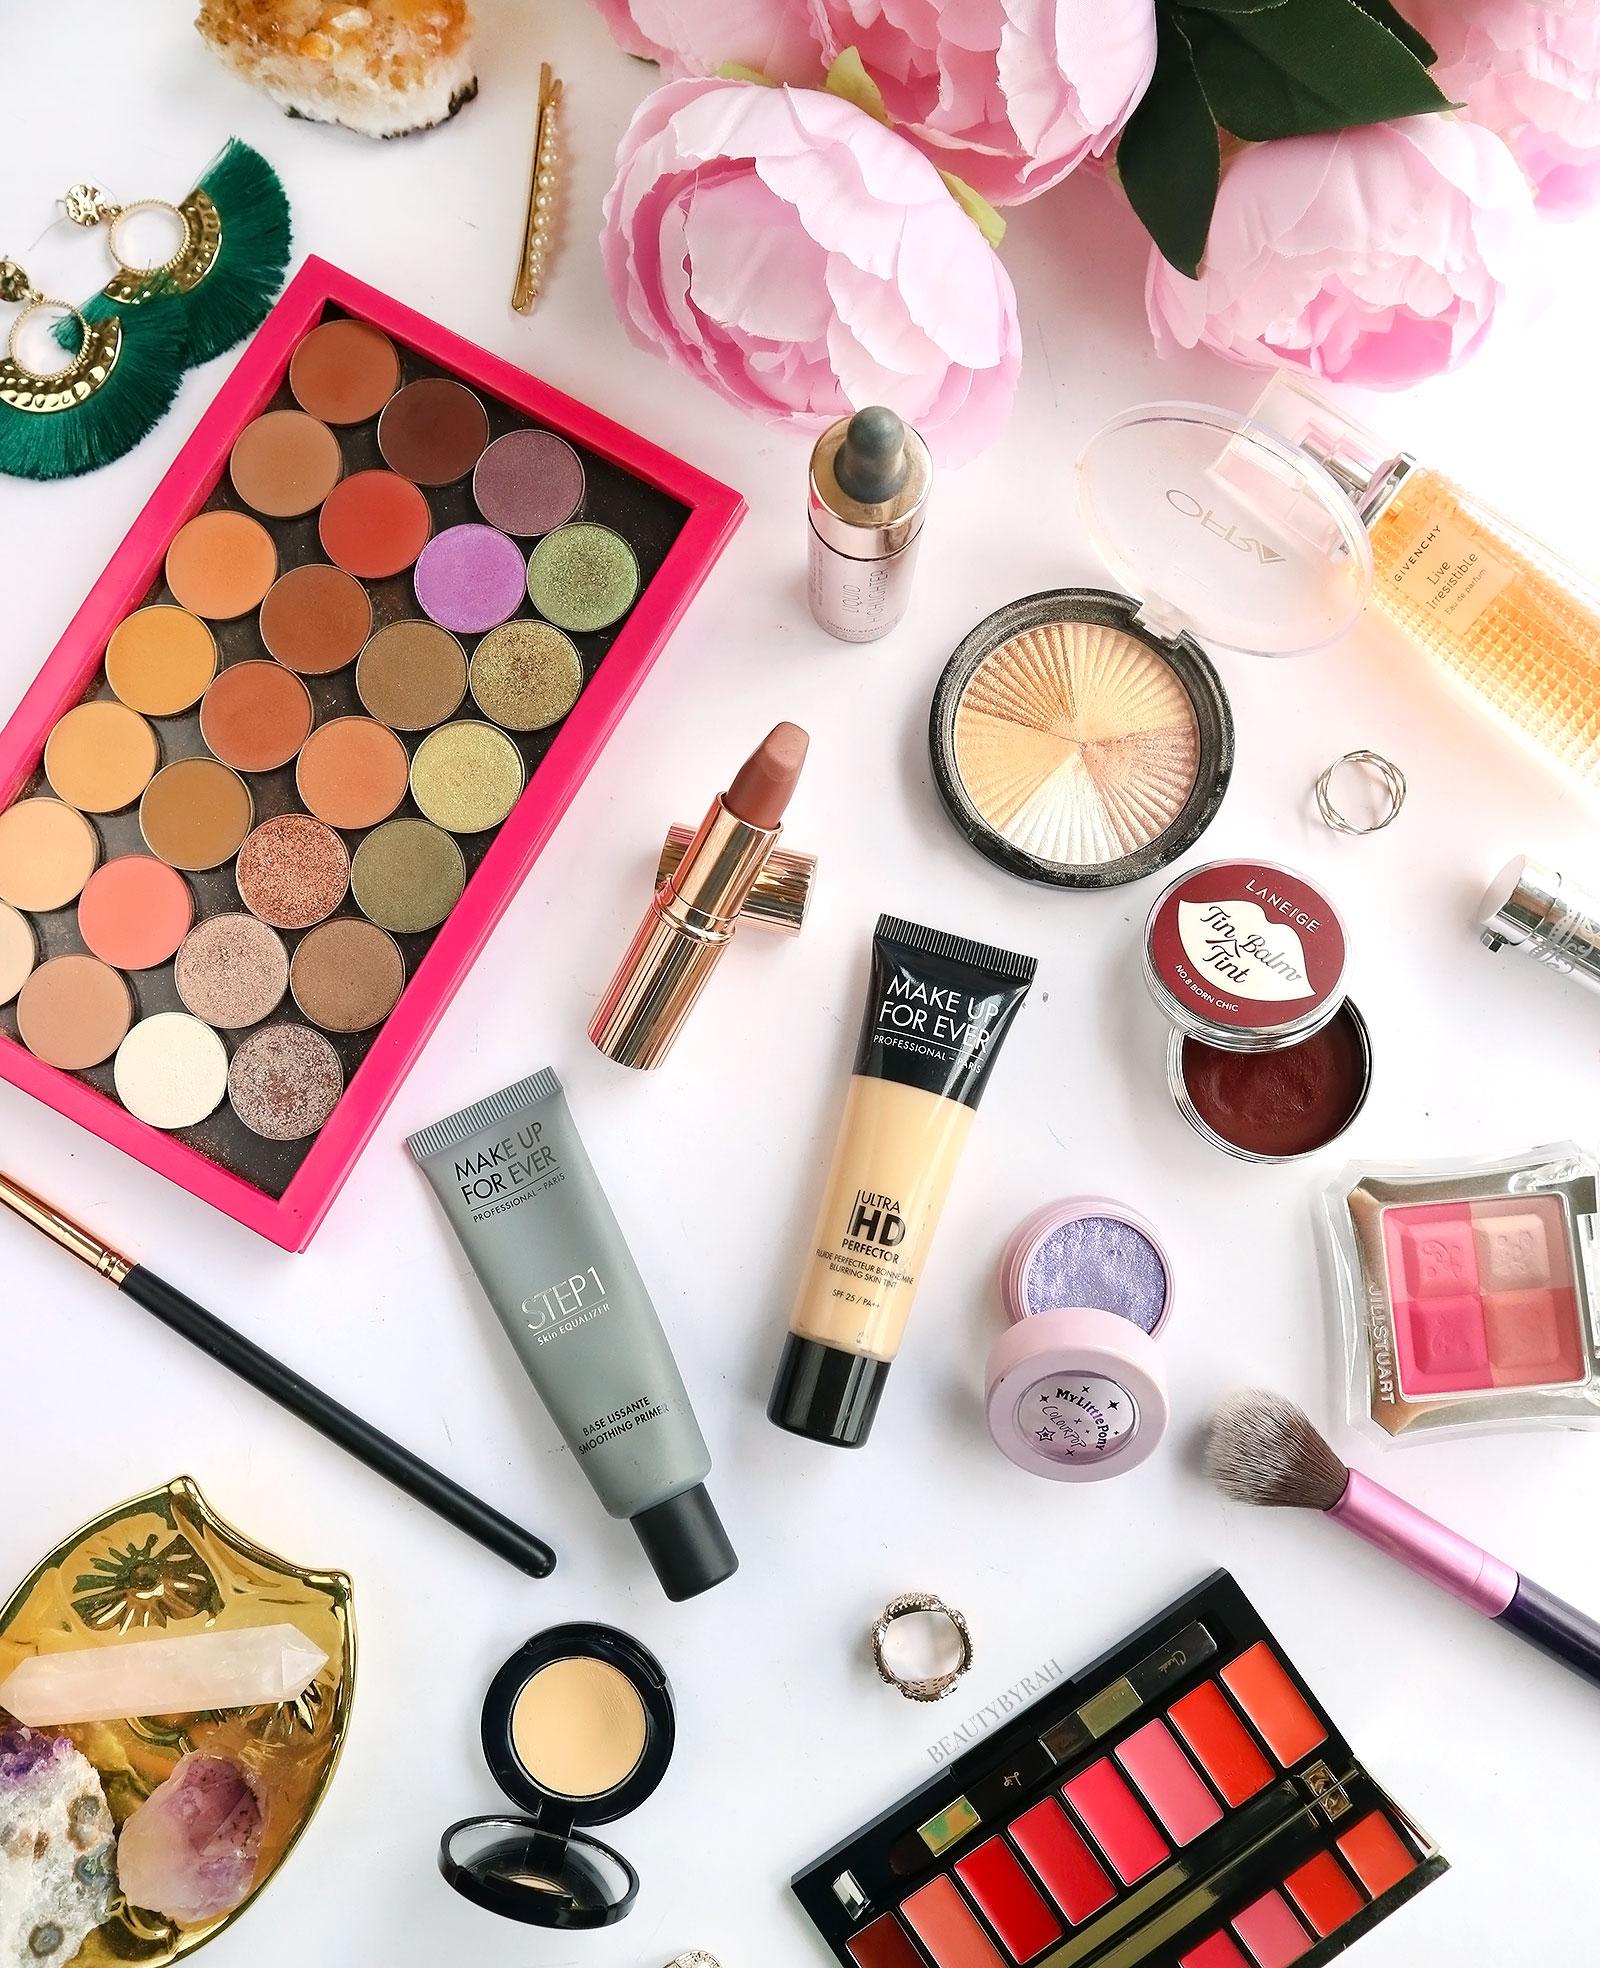 12 Makeup Tips for Makeup Beginners - Beautybyrah